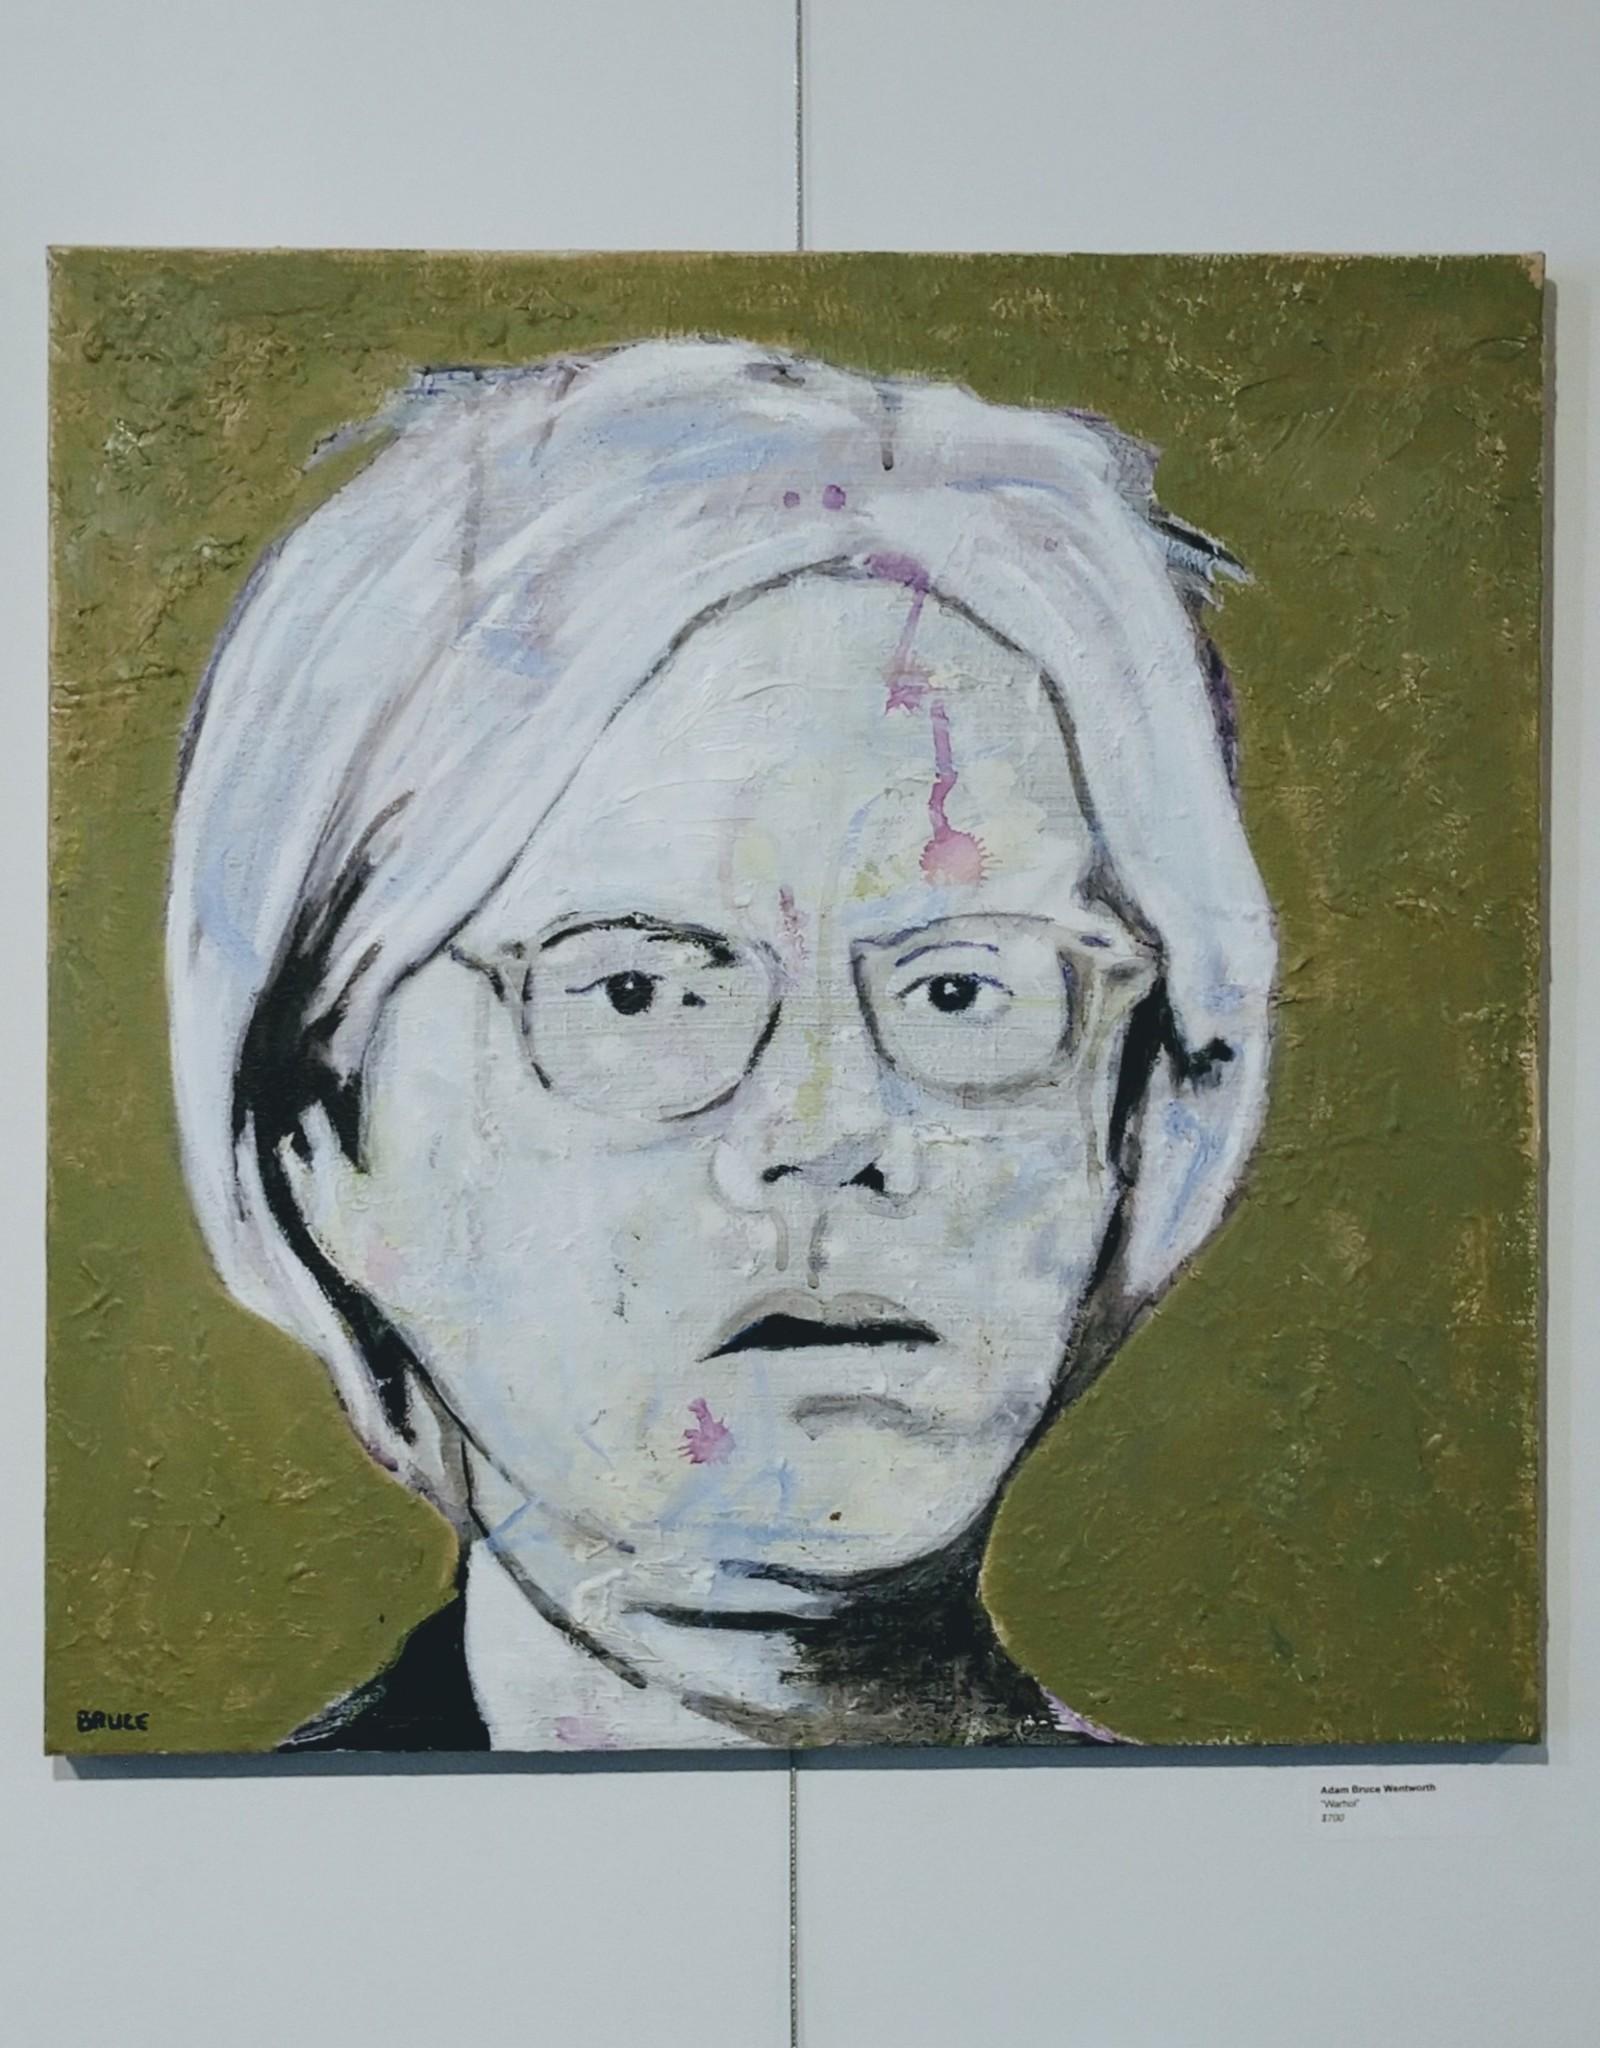 Adam Bruce Wentworth Adam Bruce Wentworth - Warhol